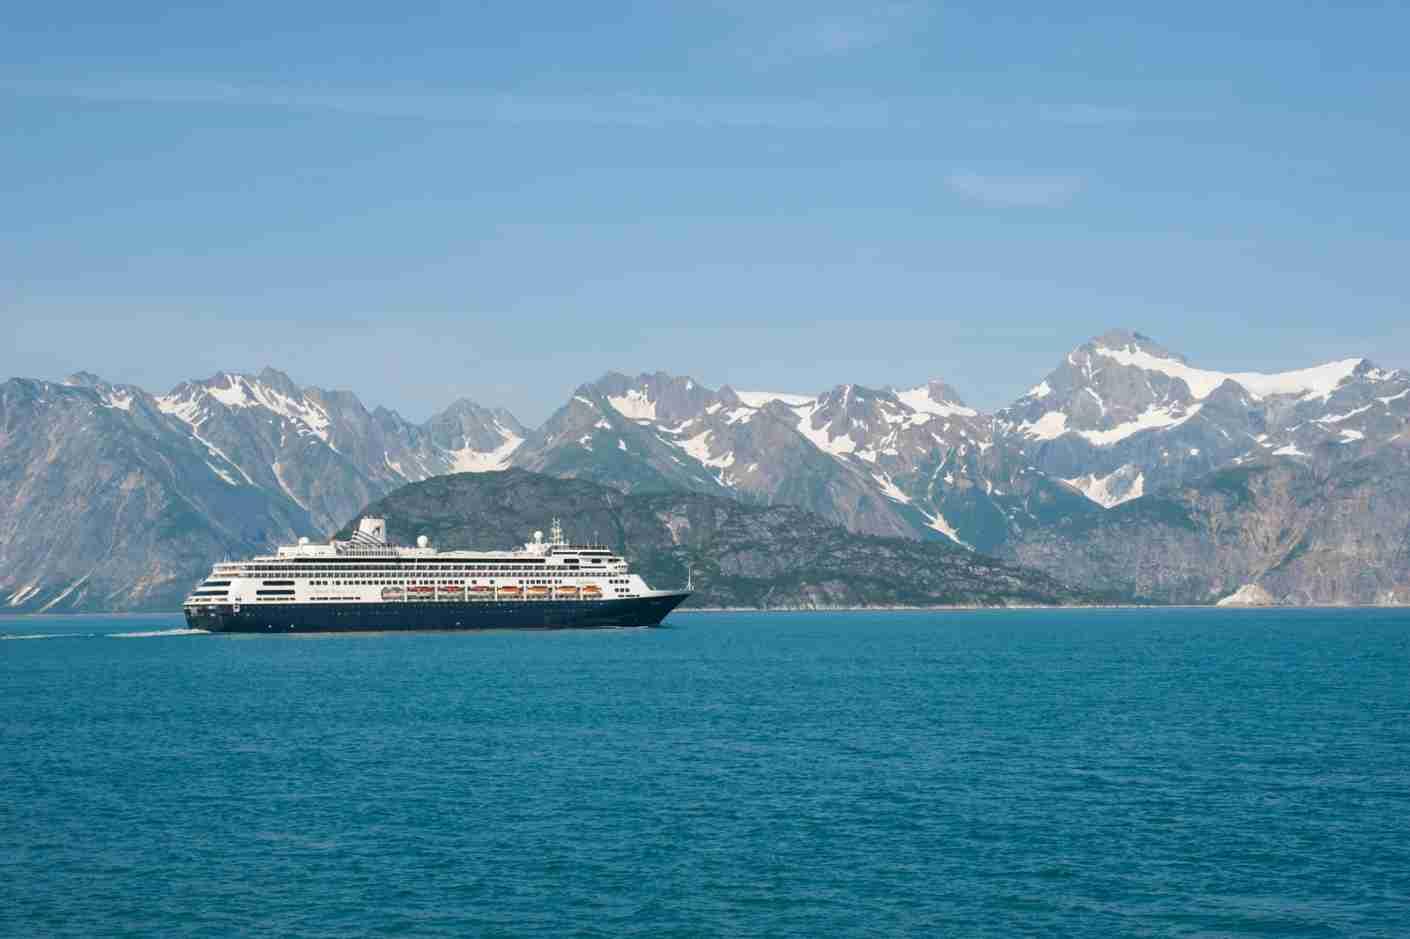 Holland America cruise ship Ms Zaandam in Glacier Bay National Park, Alaska. (Photo by Wolfgang Kaehler/LightRocket via Getty Images)